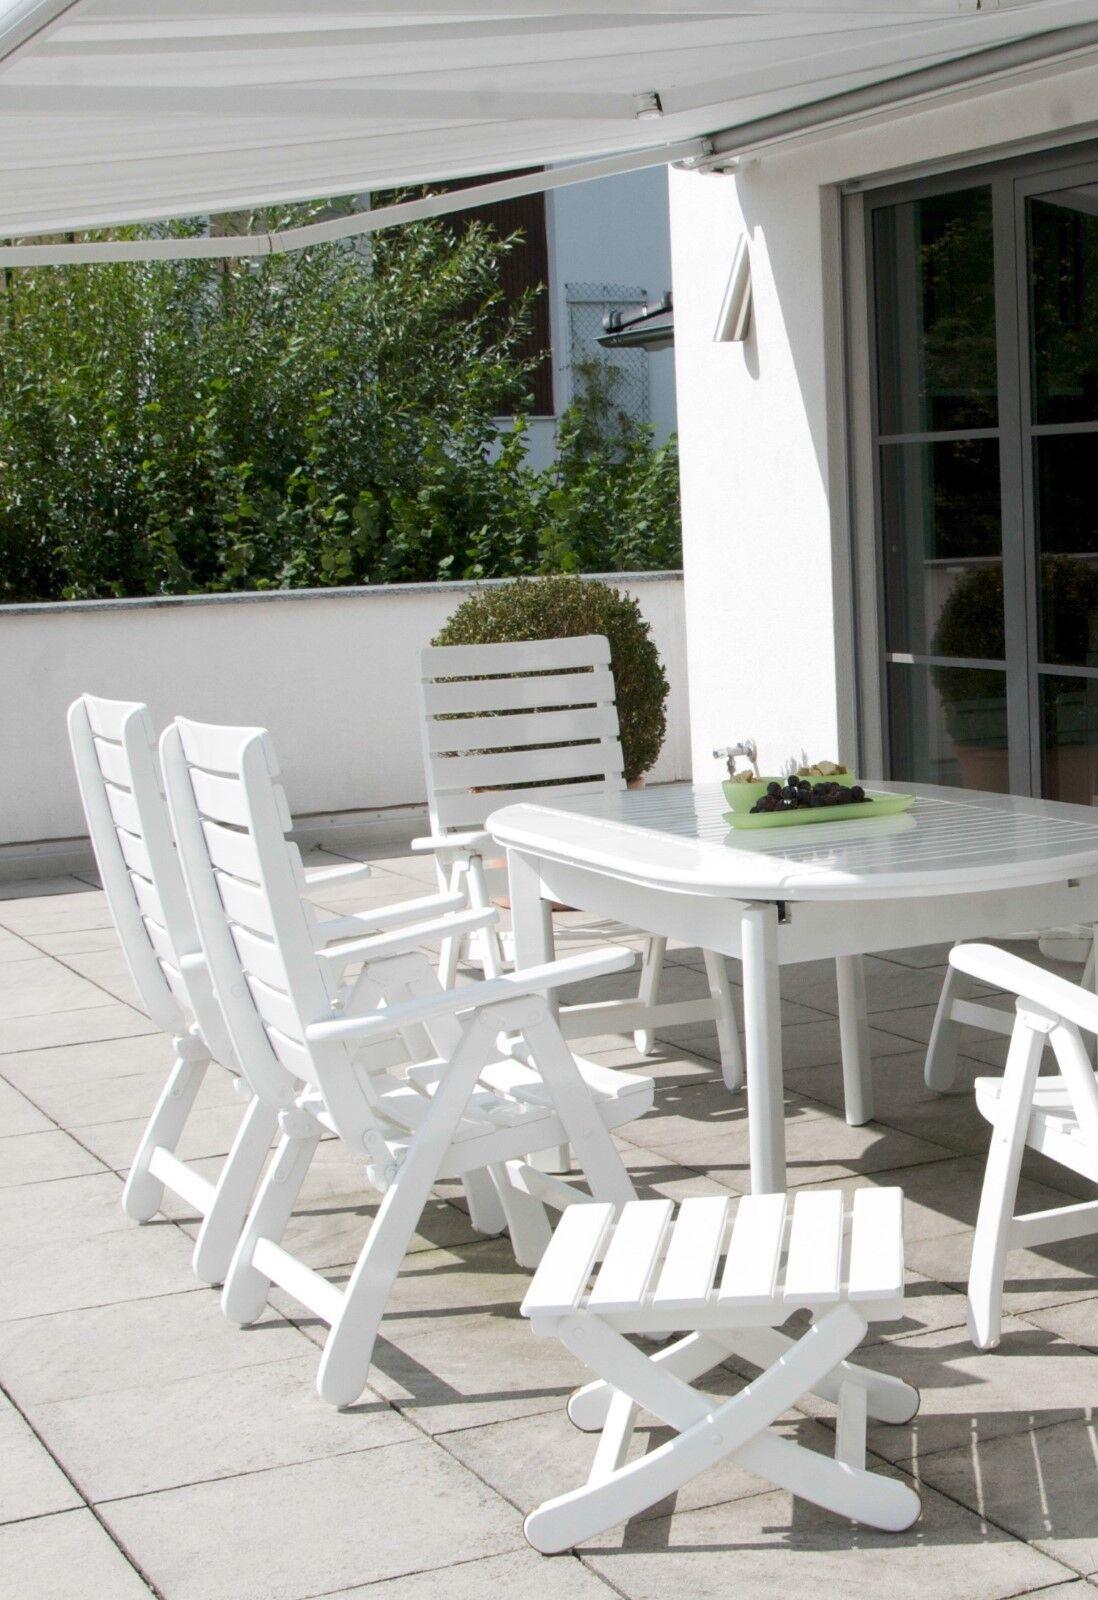 Hochlehner, Sessel, Holz, weiß lackiert, Gartenstuhl, Gartenmöbel, Terrasse